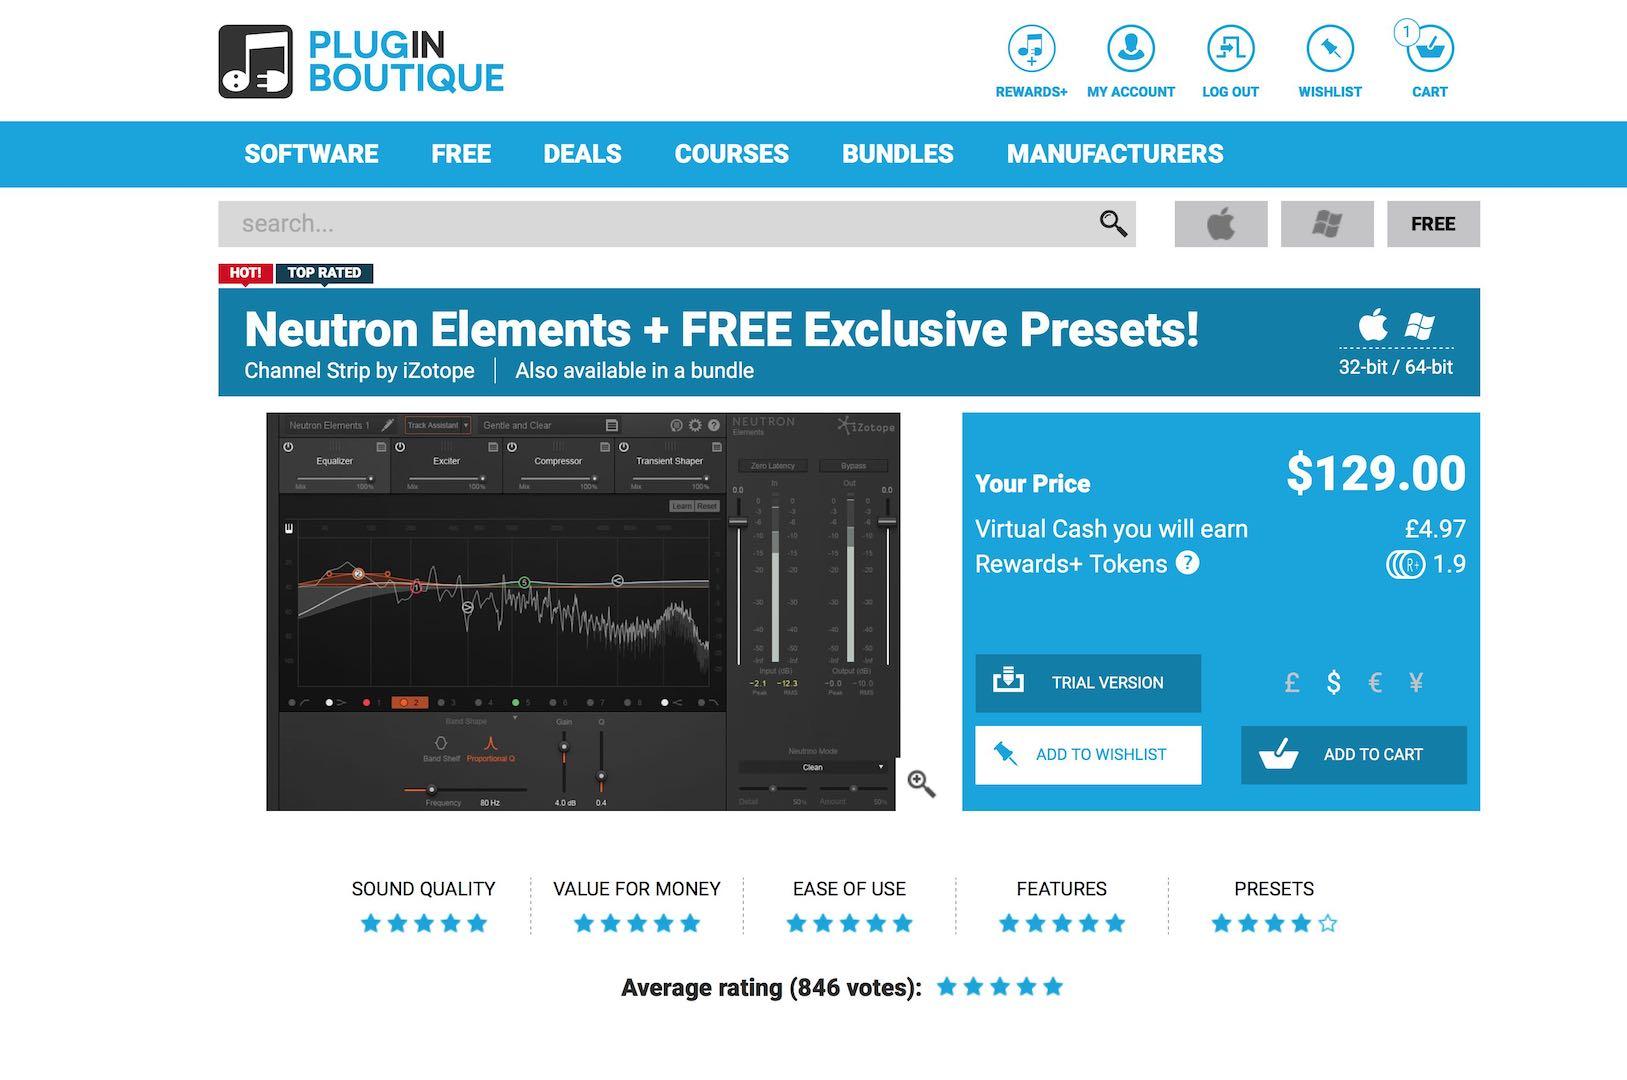 plugin boutiqueで買い物をするとizotope neutron elementsがタダで